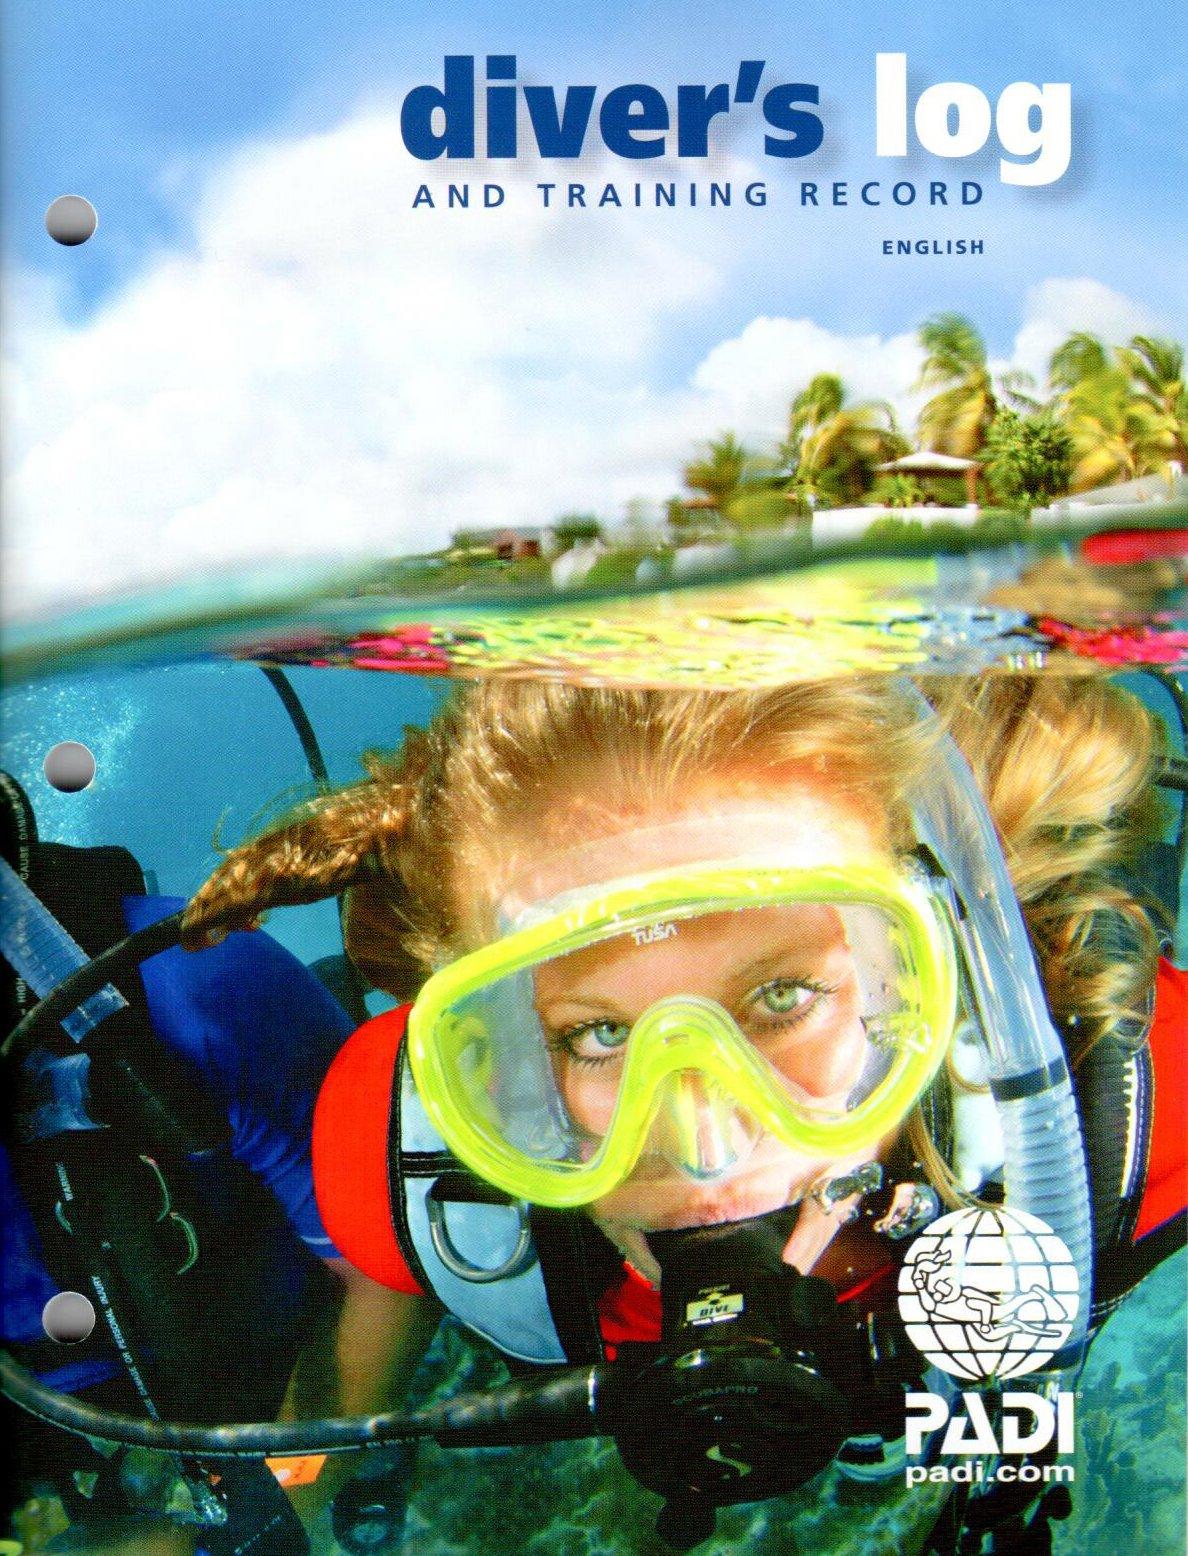 PADI Diver's Blue Log and Training Record (70047) Rev. 3.0 by Padi